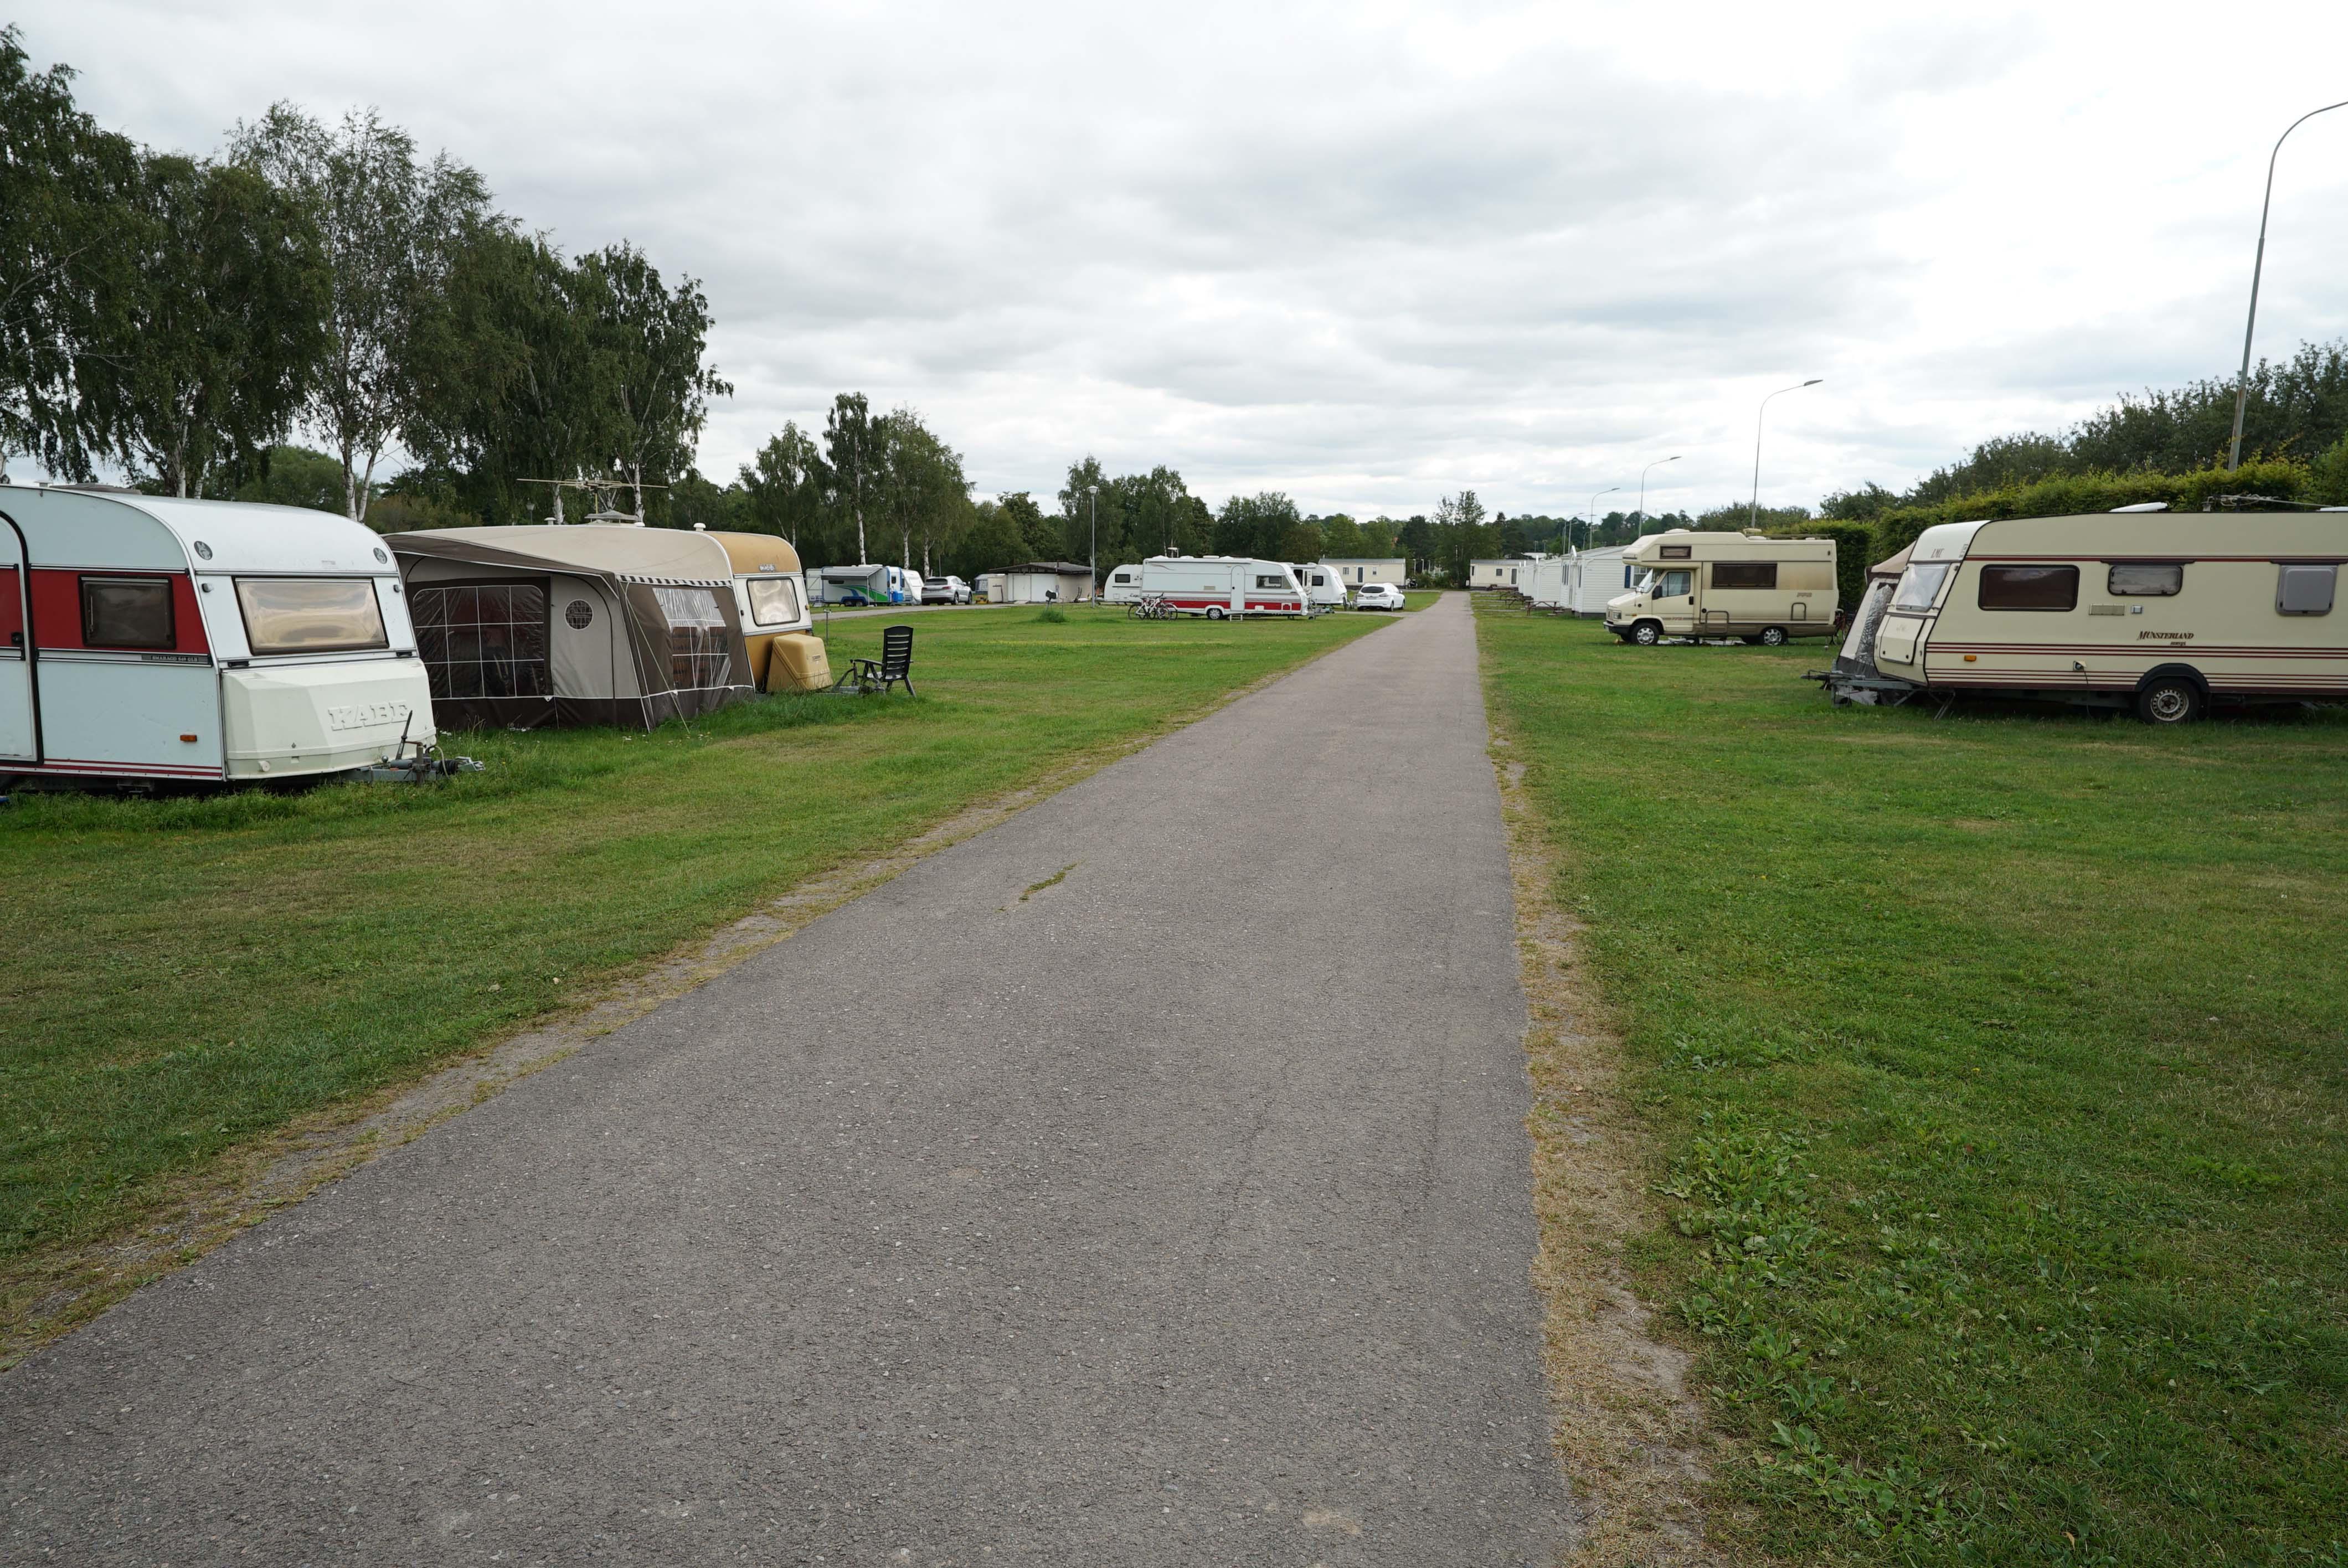 Norrköping_Camping03